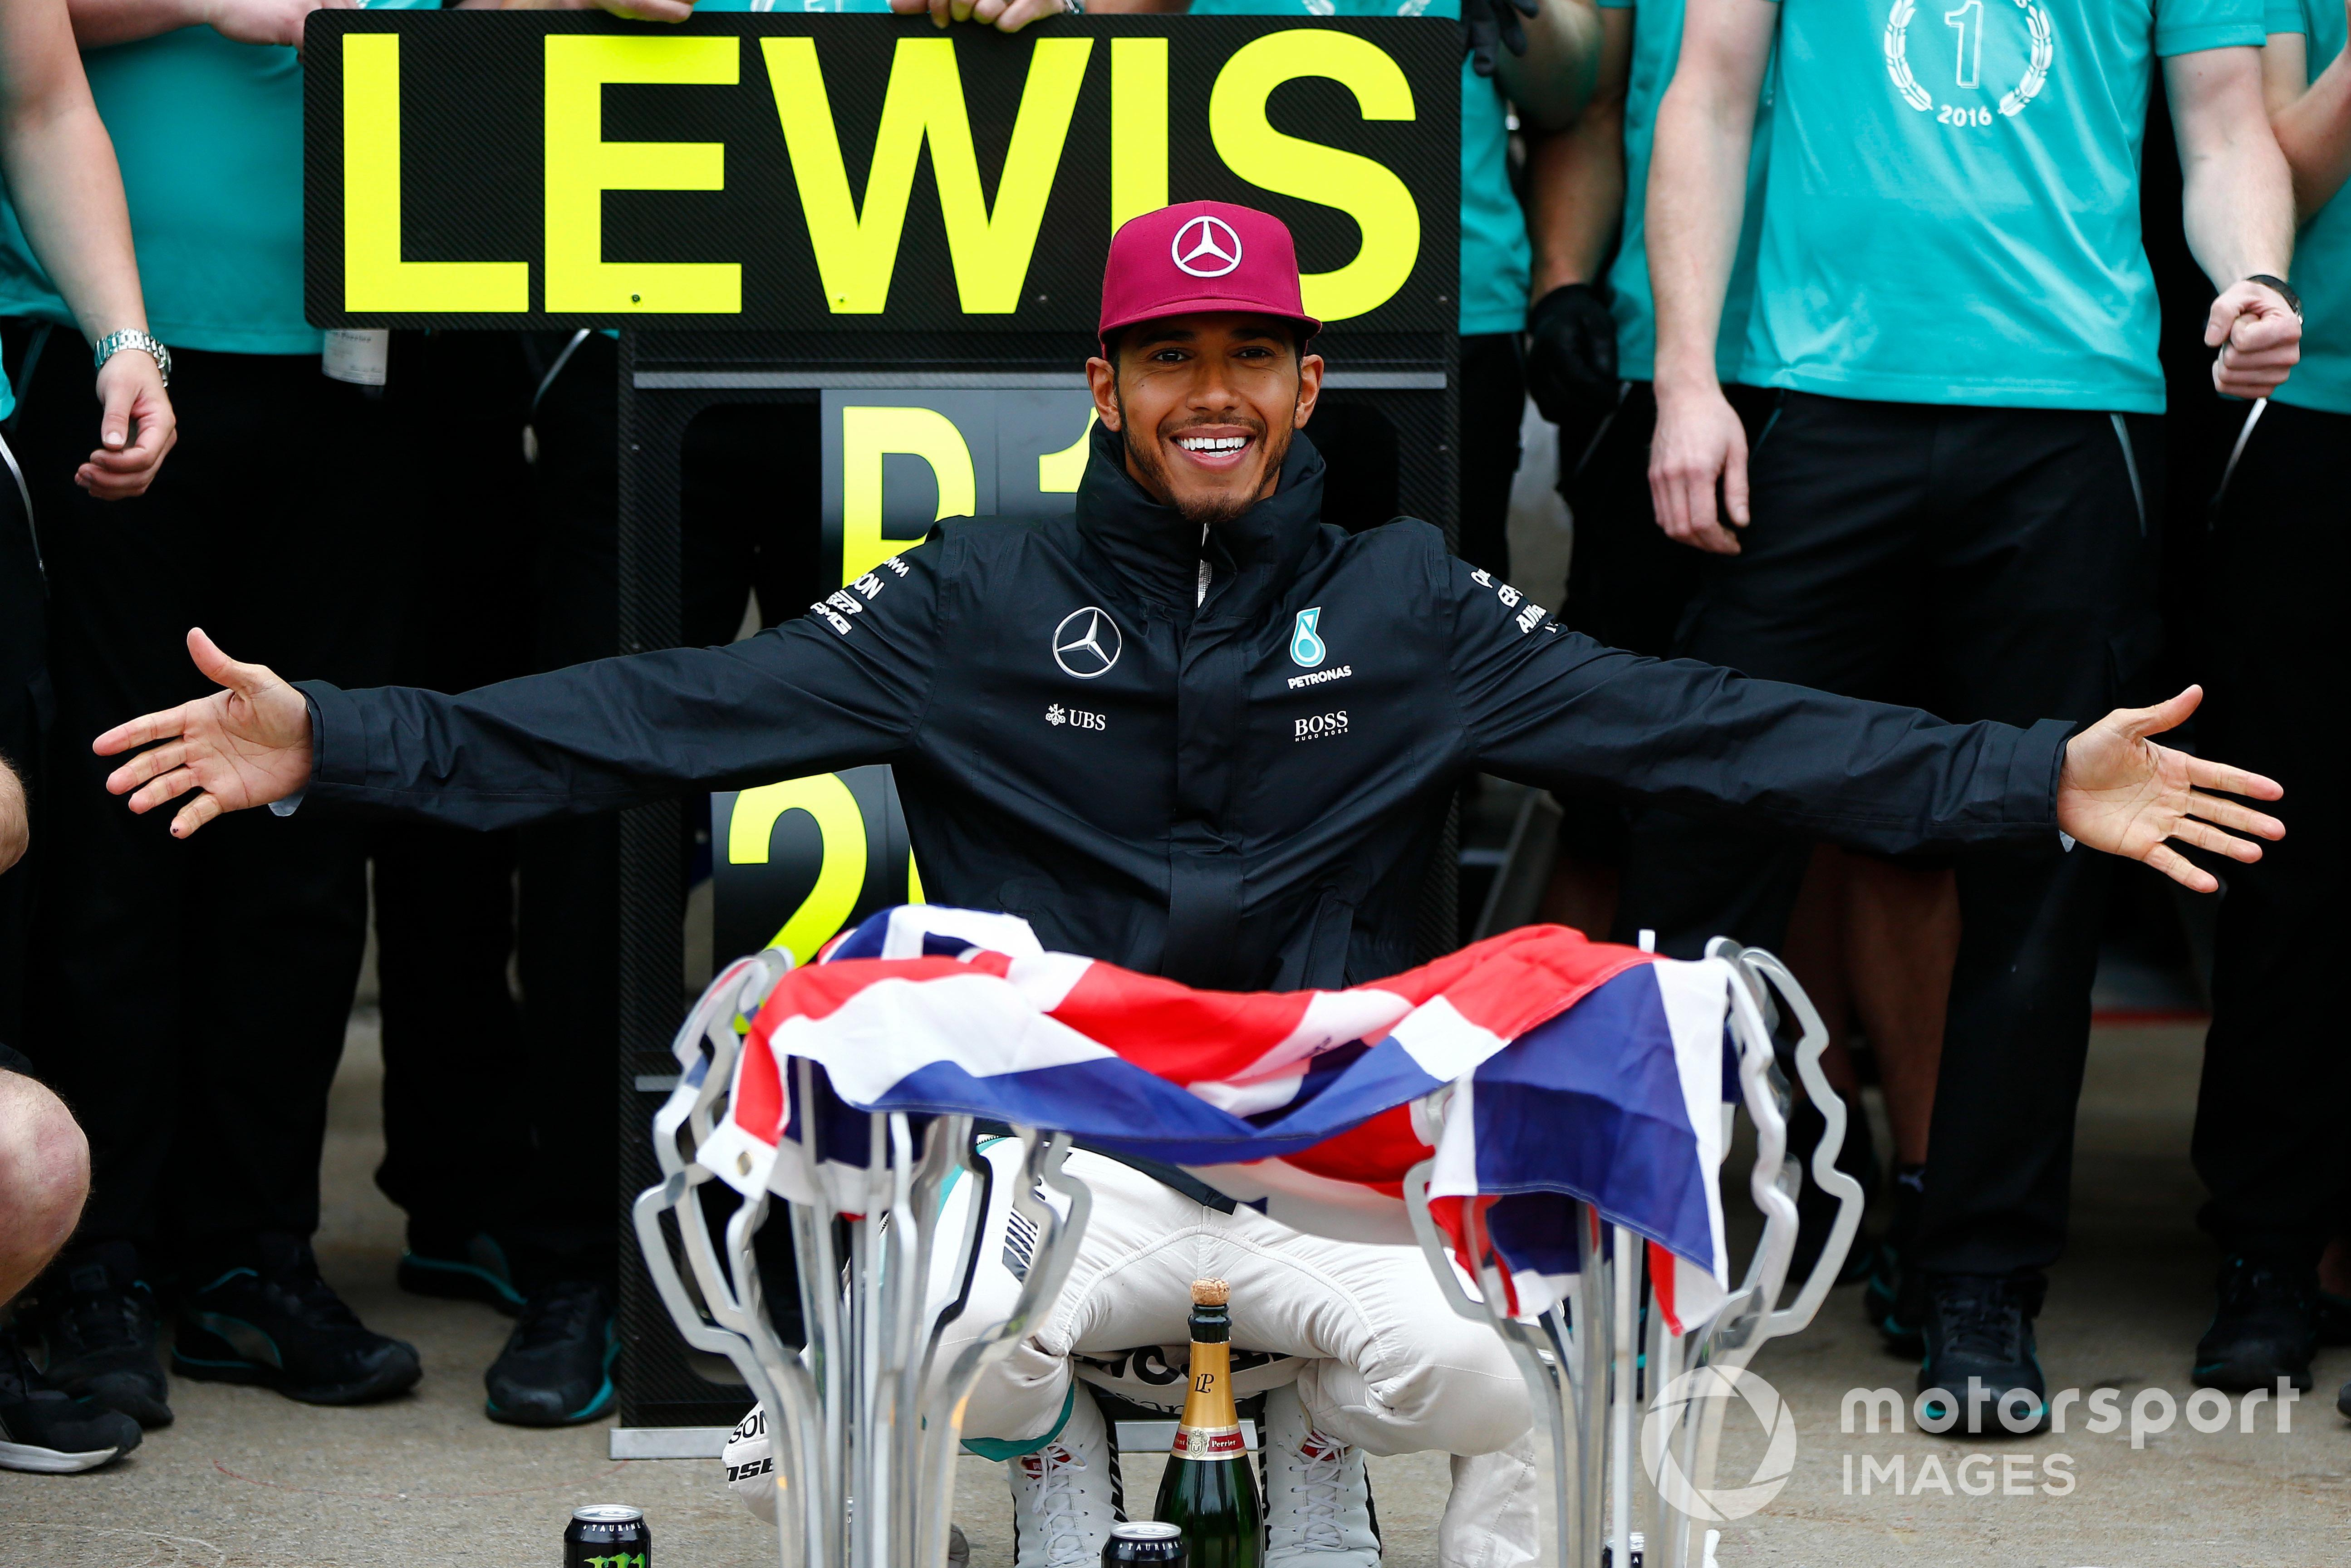 Lewis Hamilton, 2016 Canadian GP